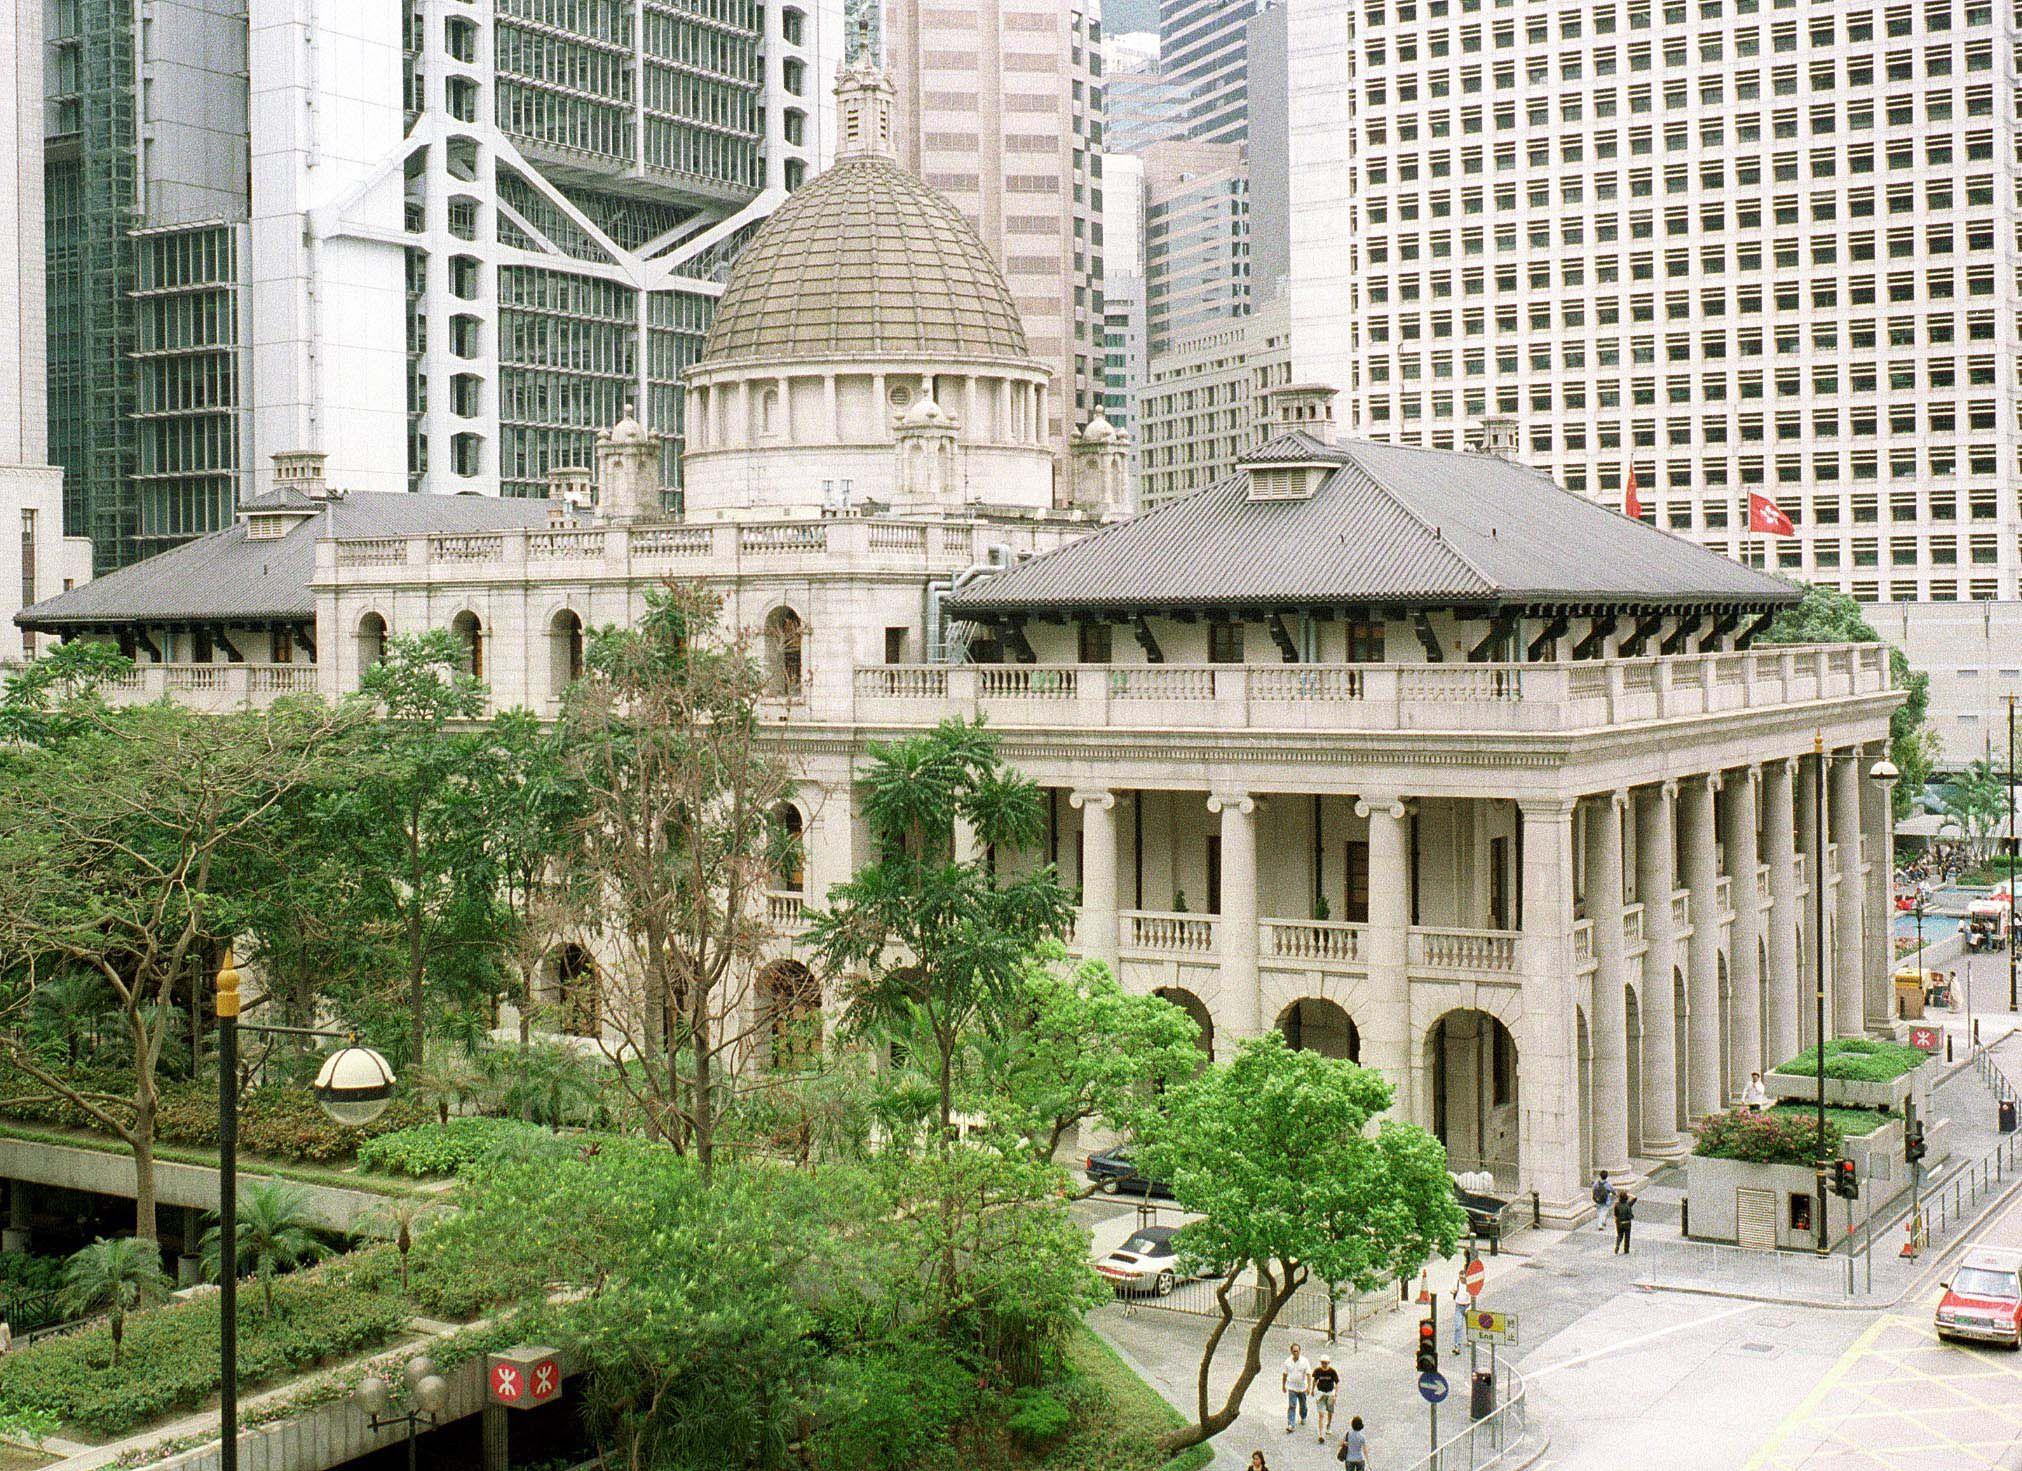 The Legislative Council (Legco Building Of The Hong Kong Special Administrative Region China